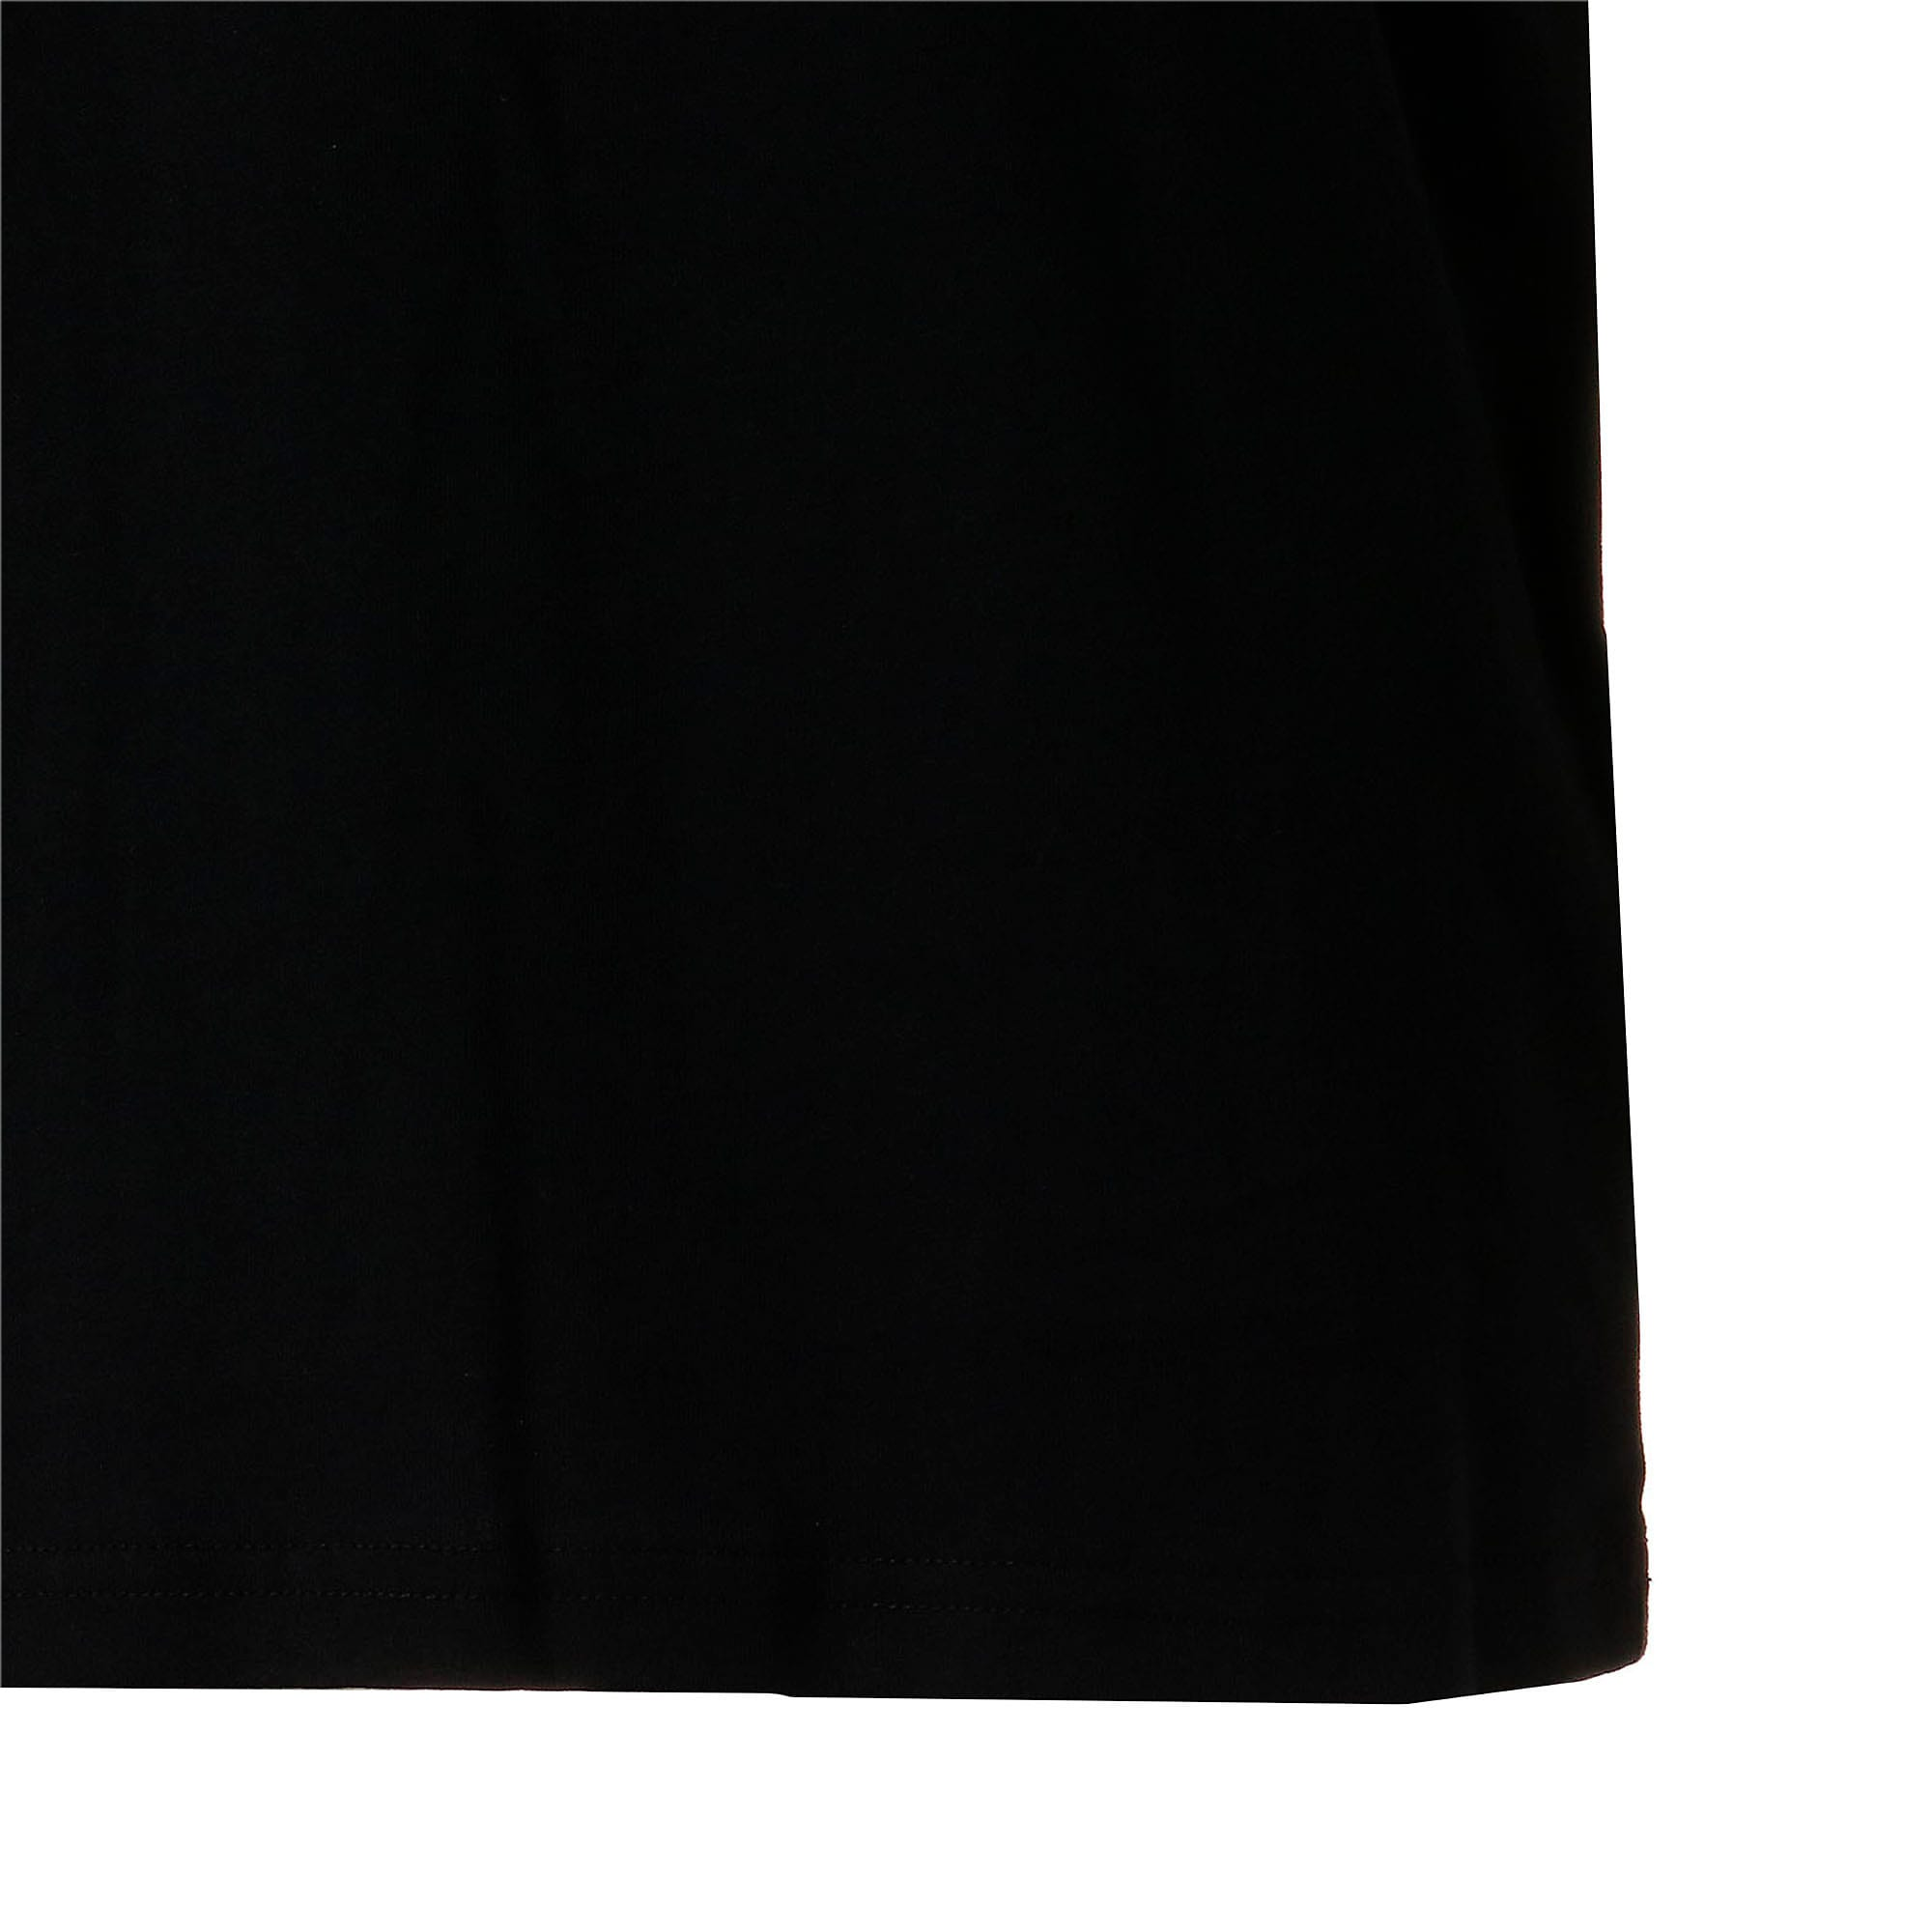 Thumbnail 9 of PUMA x LES BENJAMINS Tシャツ, Puma Black, medium-JPN